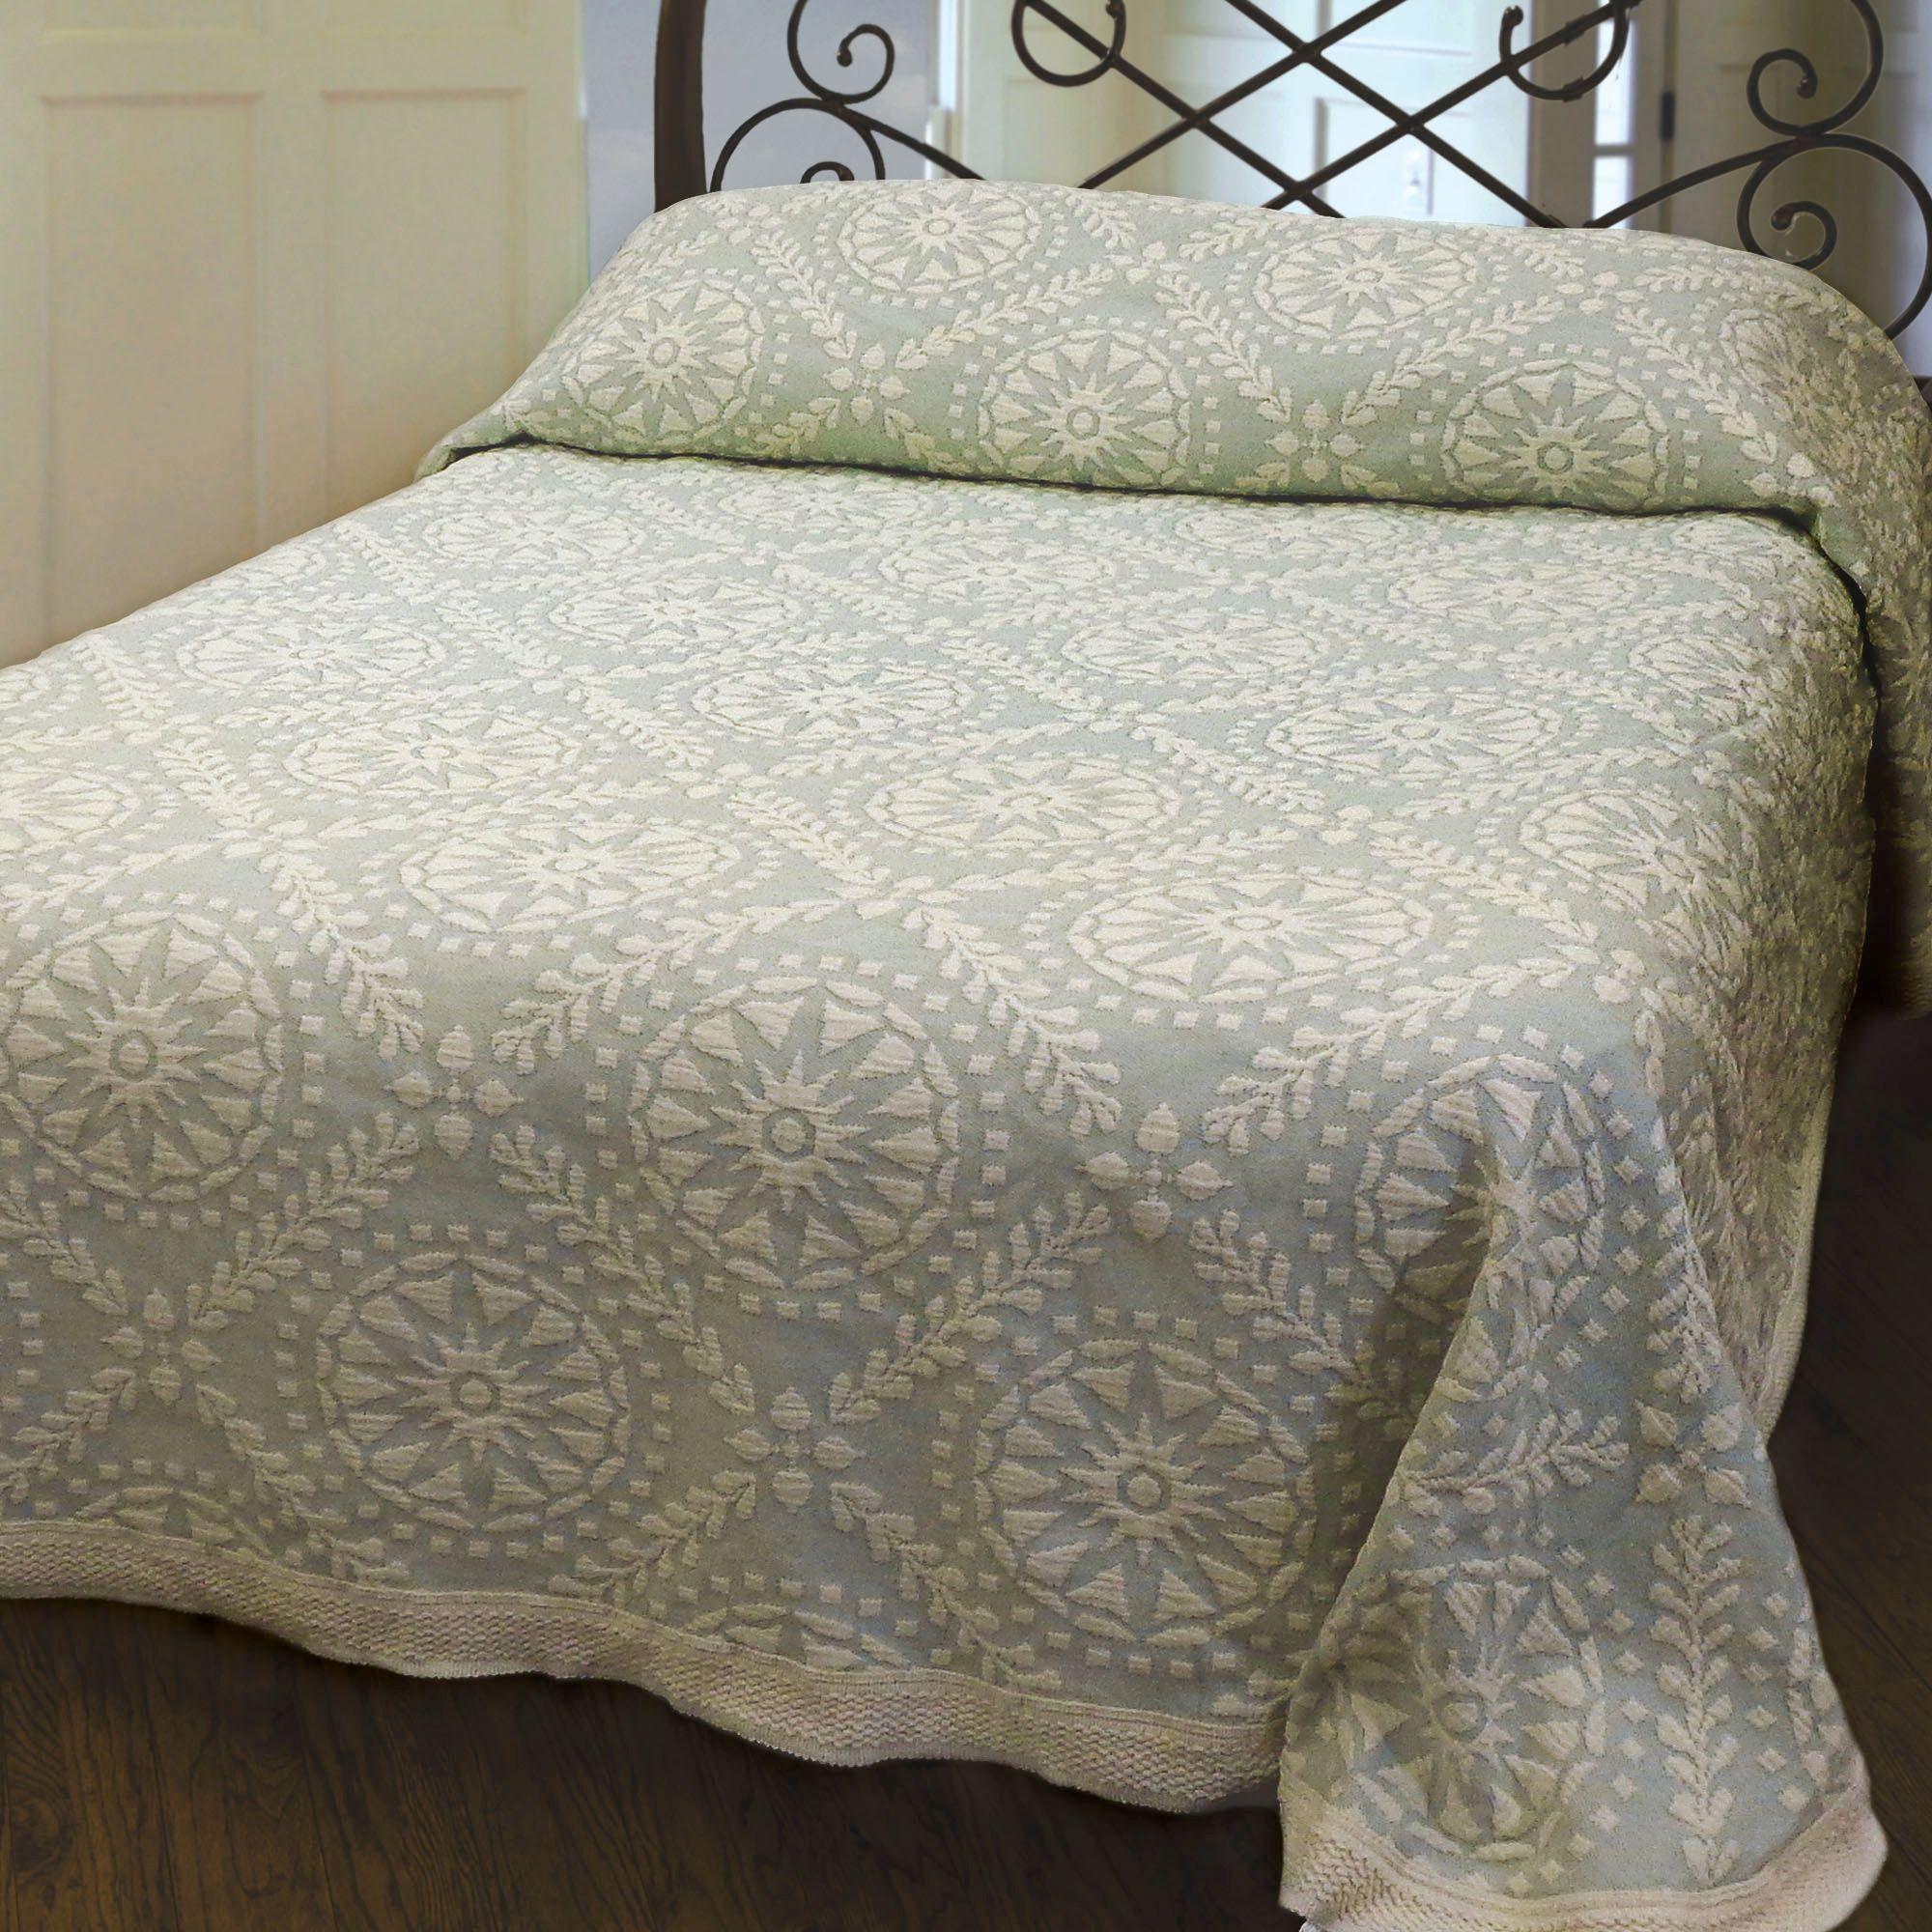 bed epoque bedding coverlet by matelasse woven belle botanica p